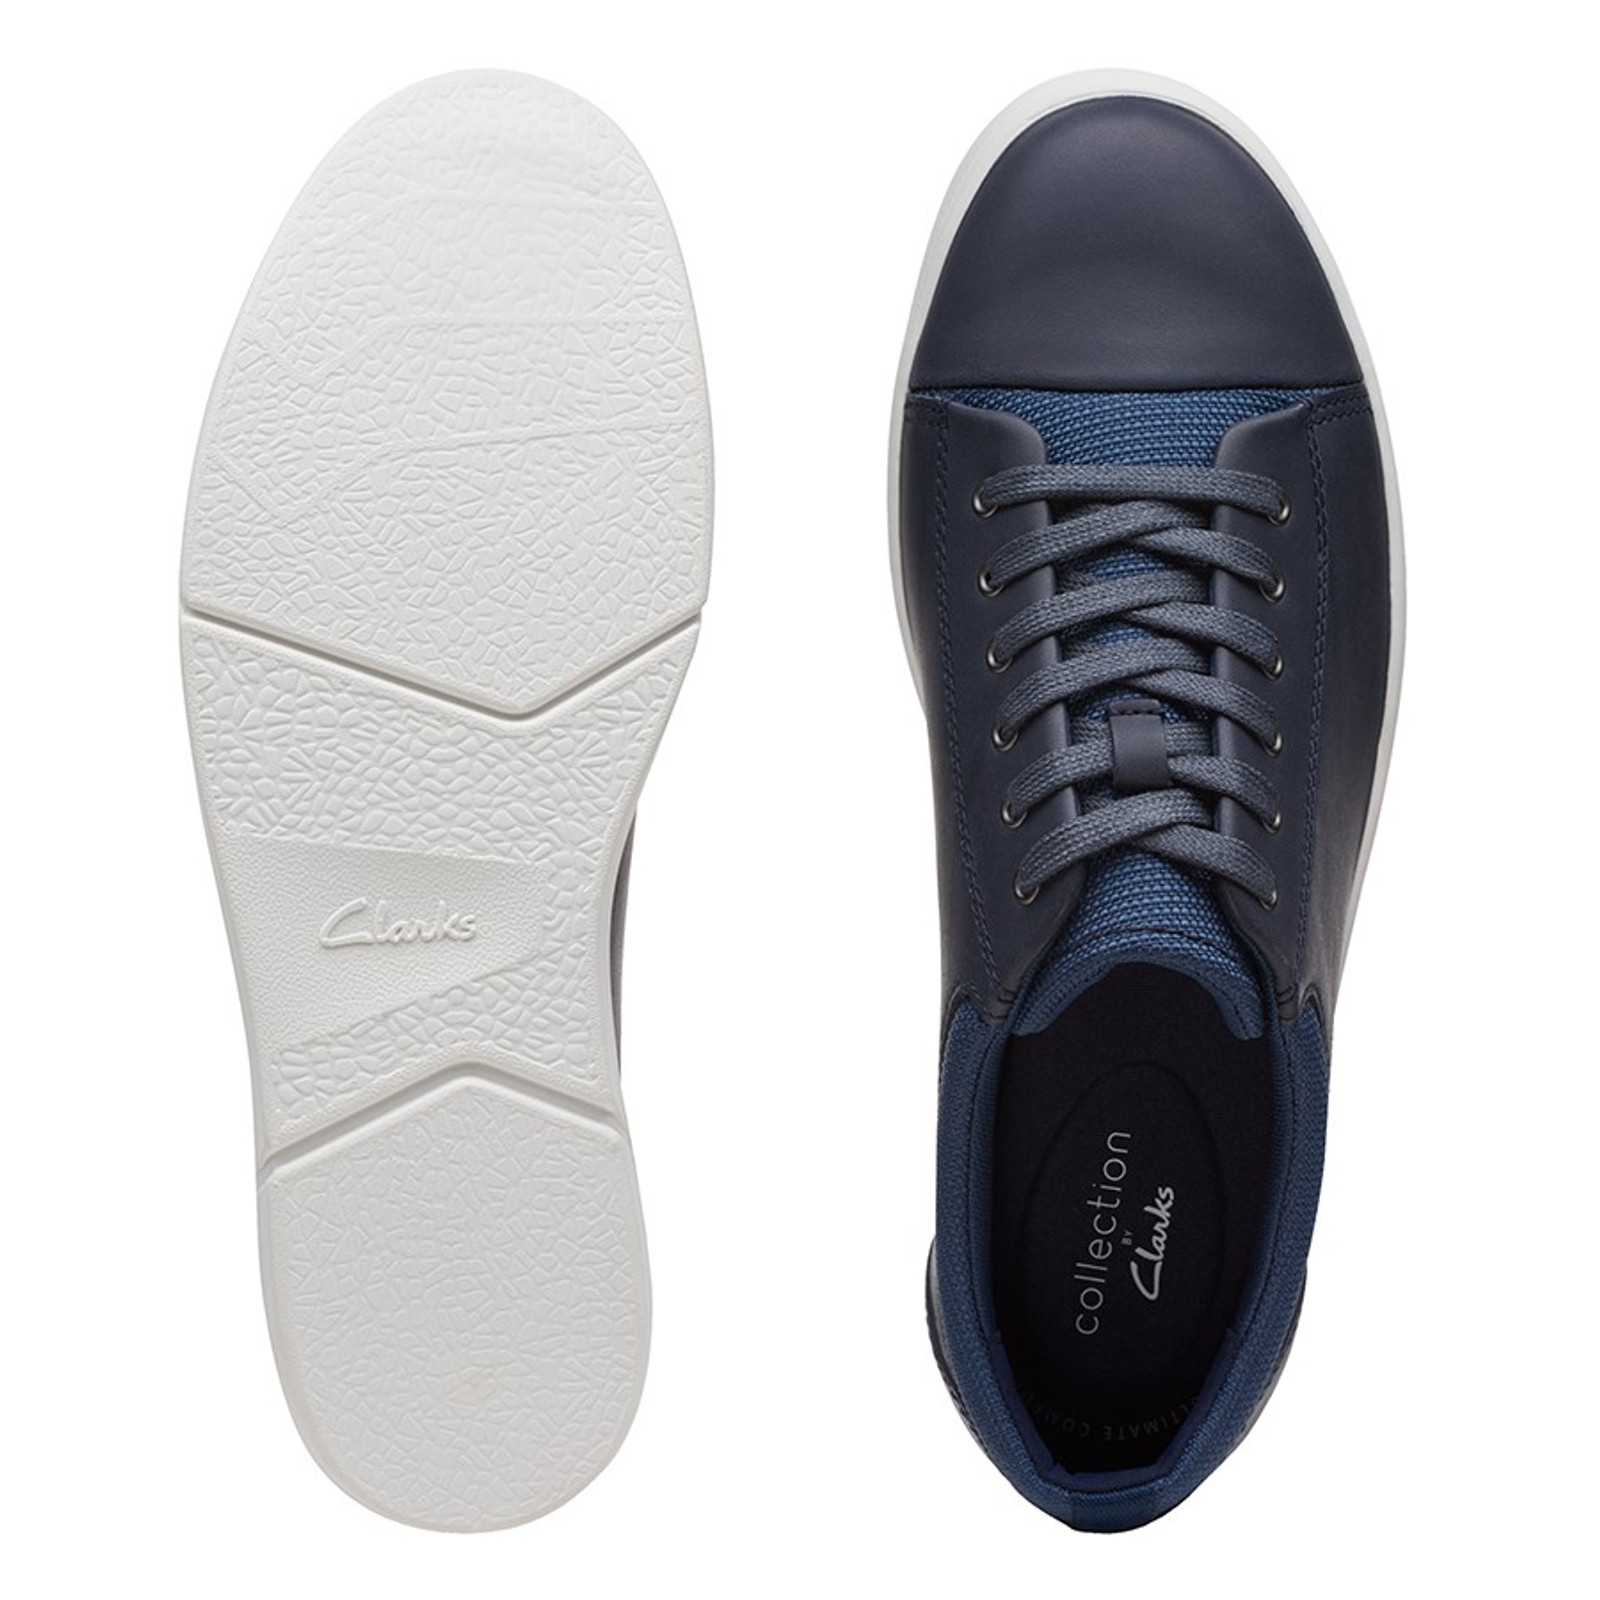 Clarks Mens LANDRY VIBE Navy Combo Leather